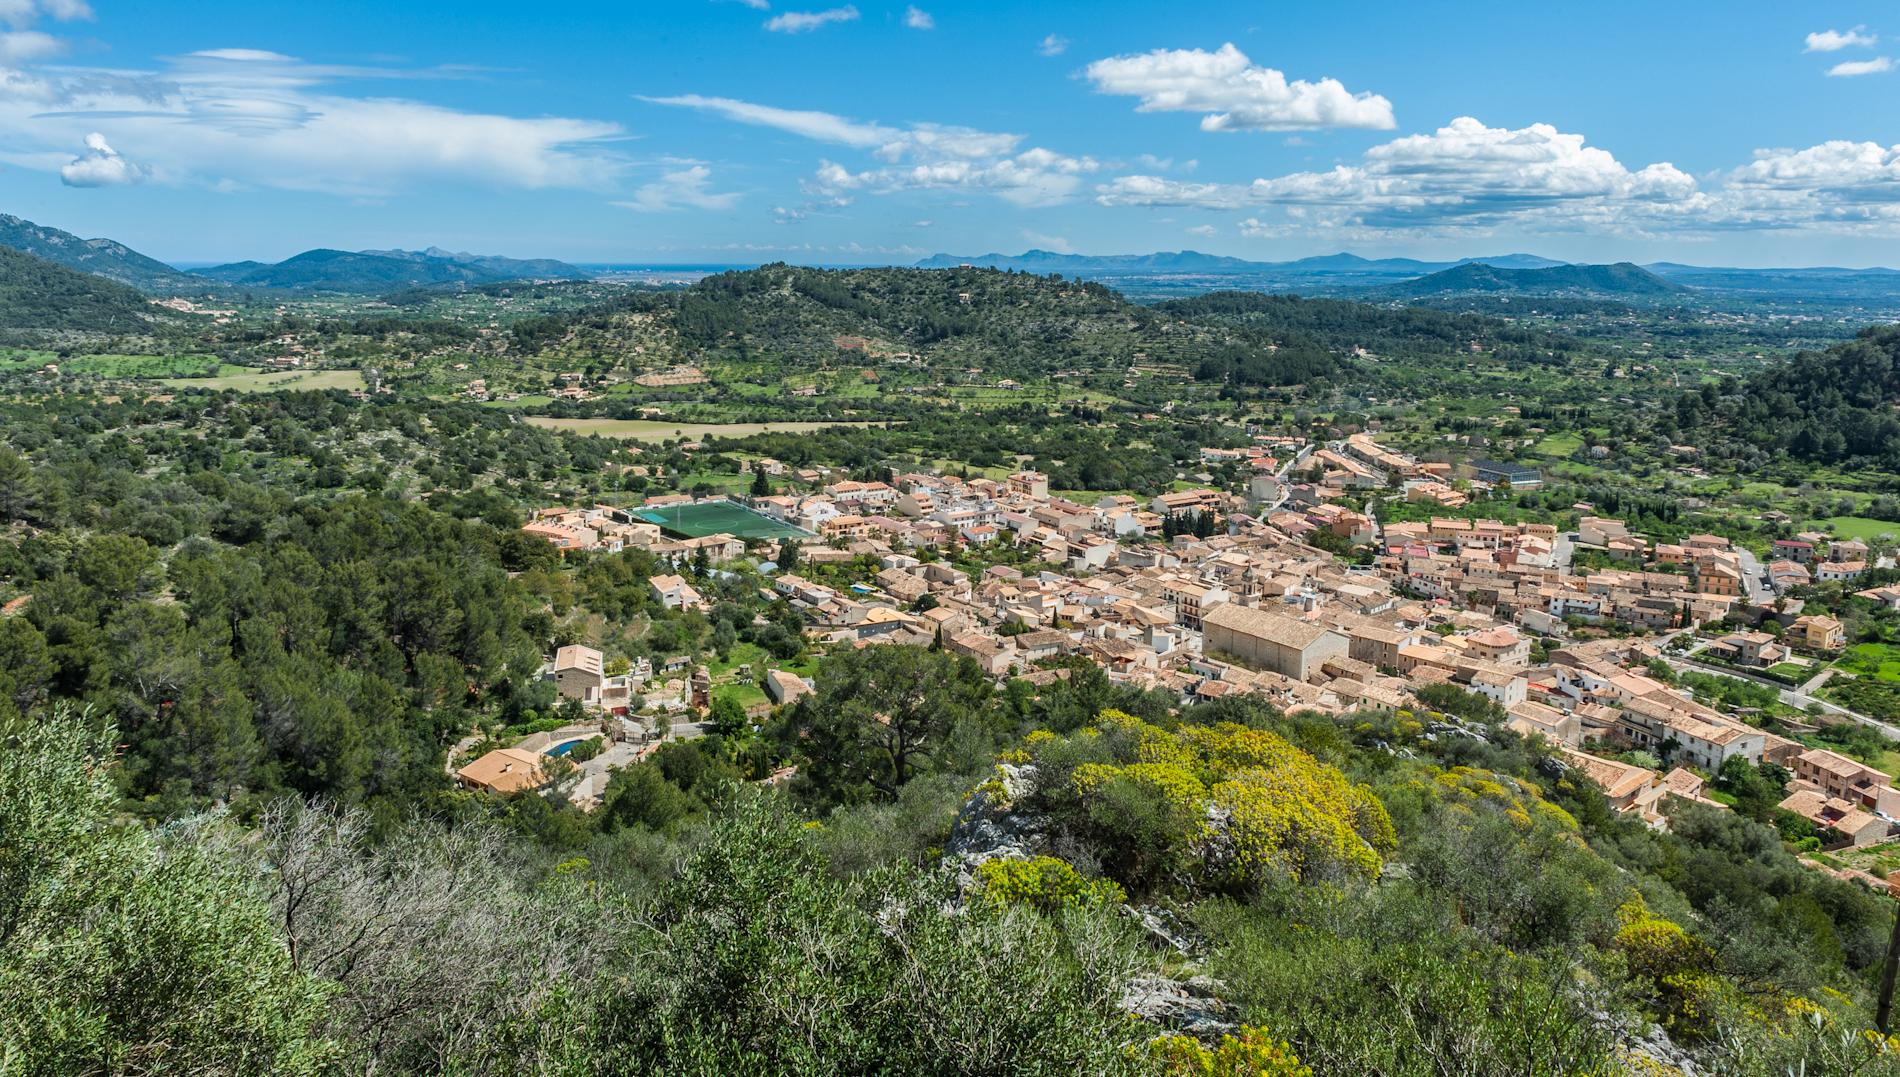 Ferienhaus SA TANCA (MANCORINA) (2037553), Mancor de la Vall, Mallorca, Balearische Inseln, Spanien, Bild 36